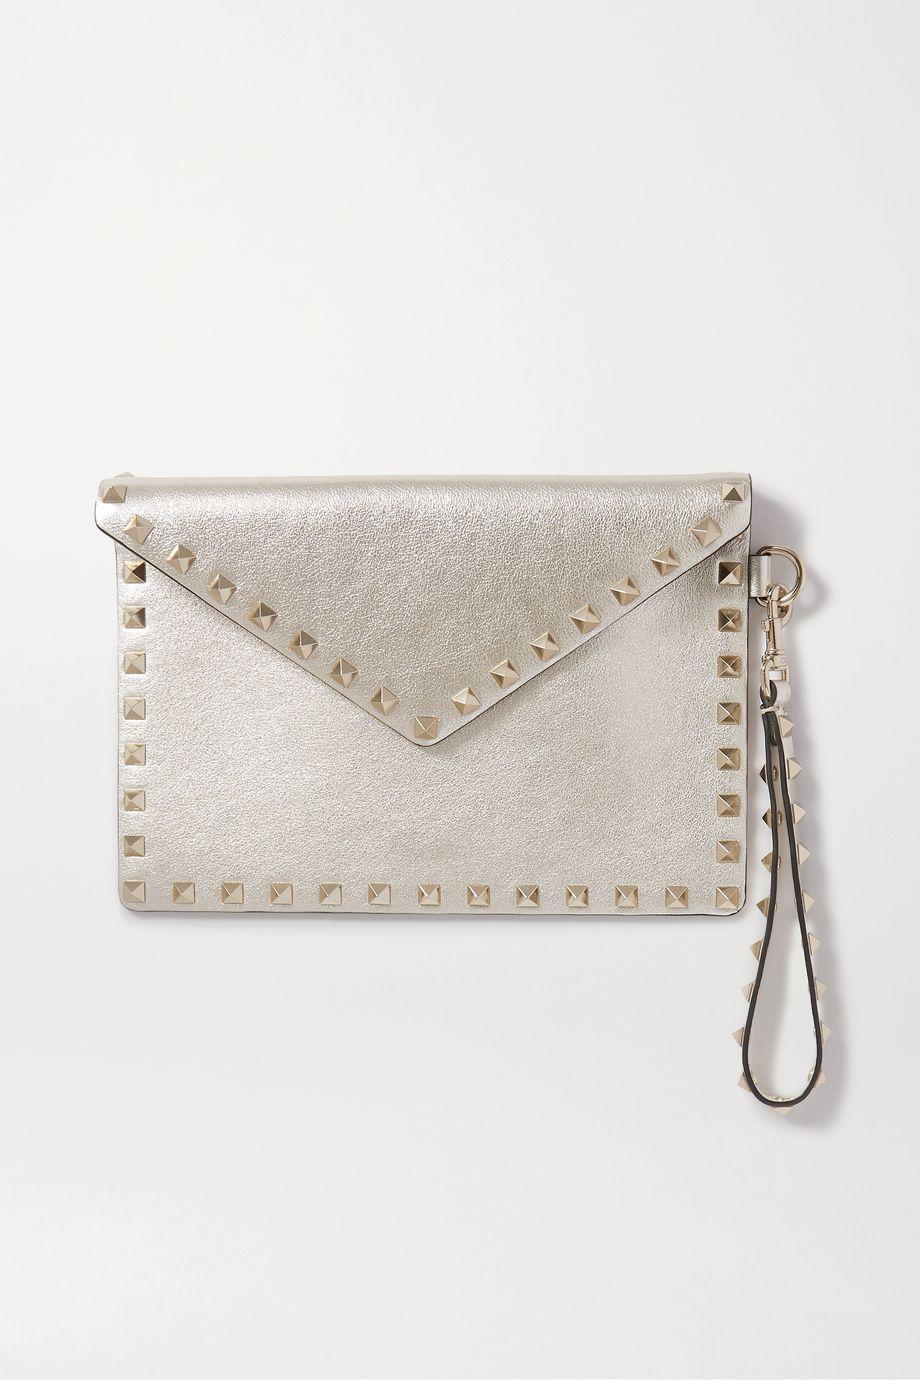 Valentino Valentino Garavani Rockstud metallic leather pouch